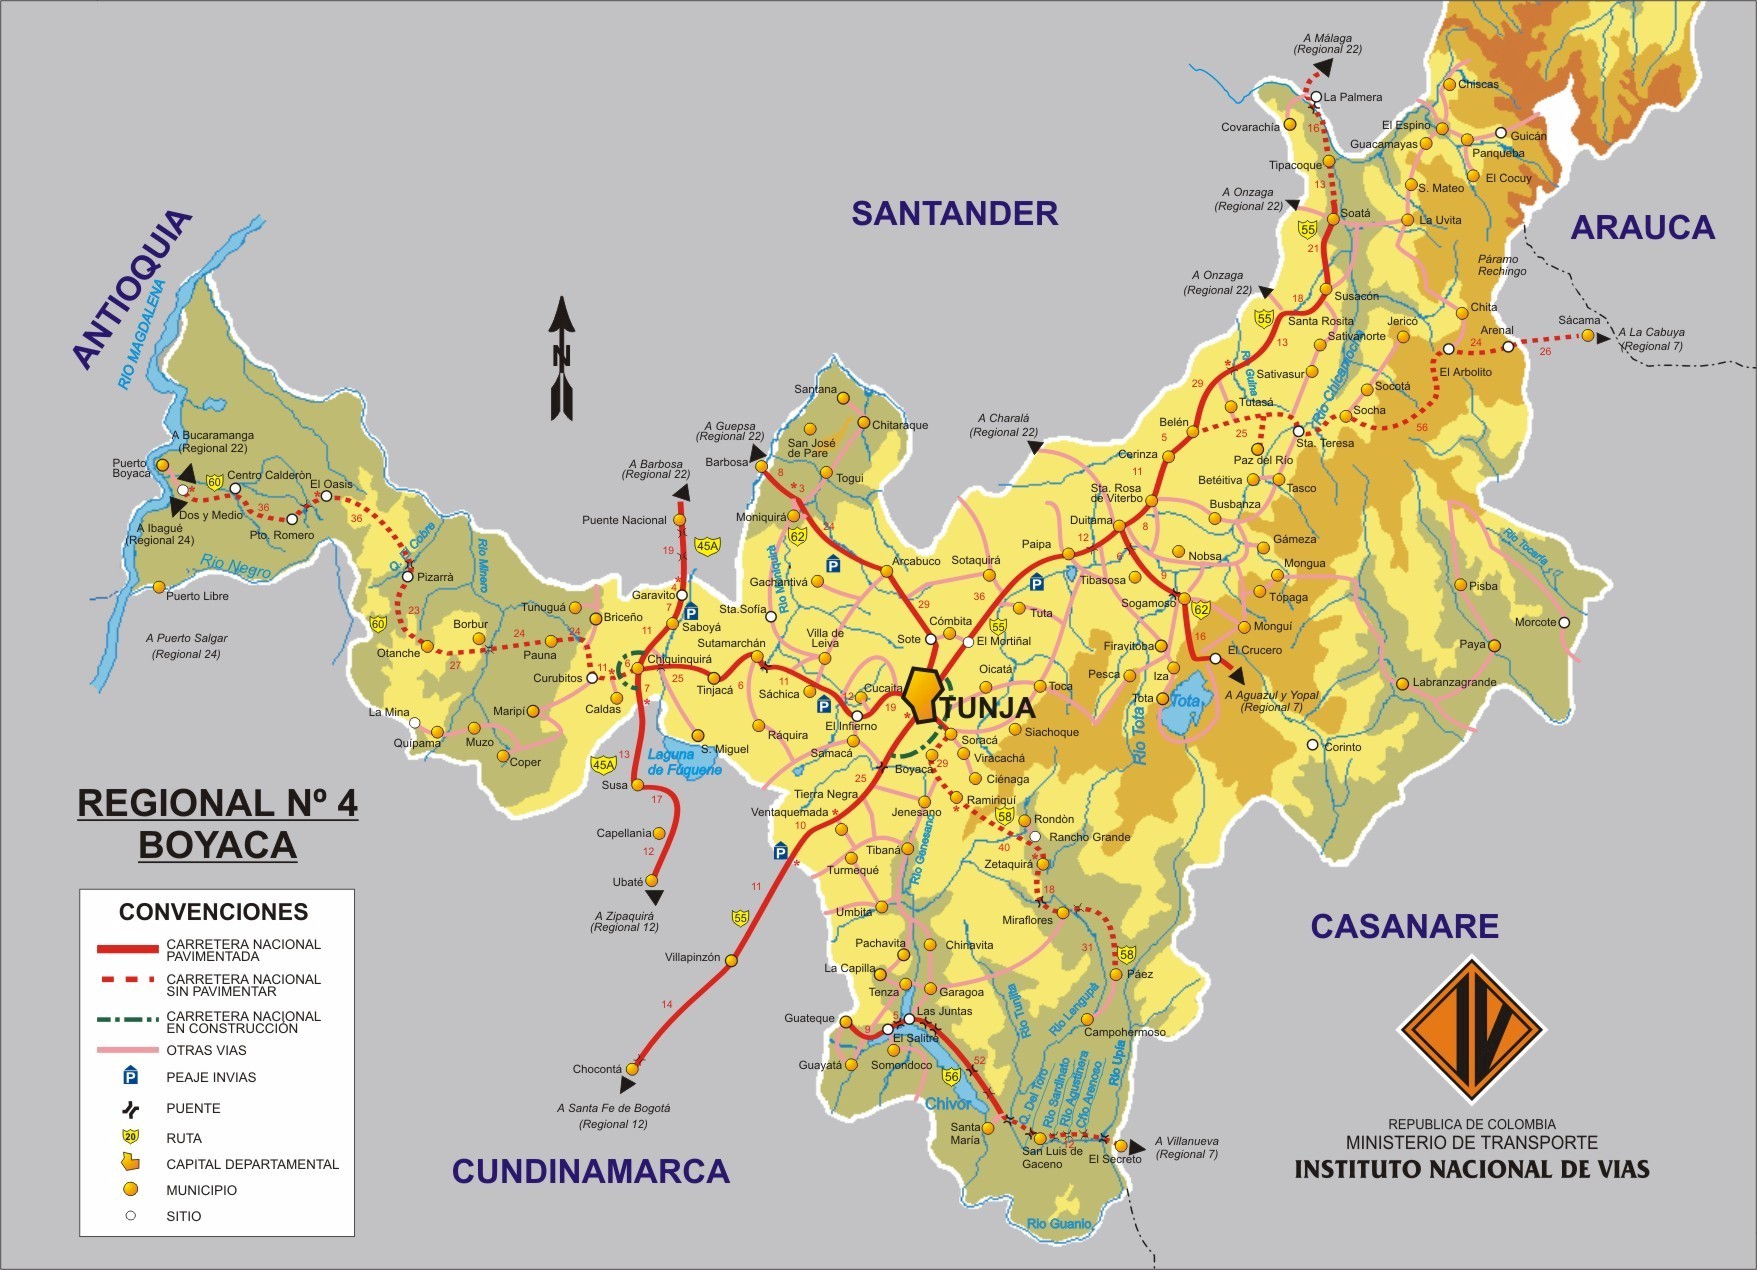 Mapa de Boyaca Colombia Mapa de Boyaca Colombia